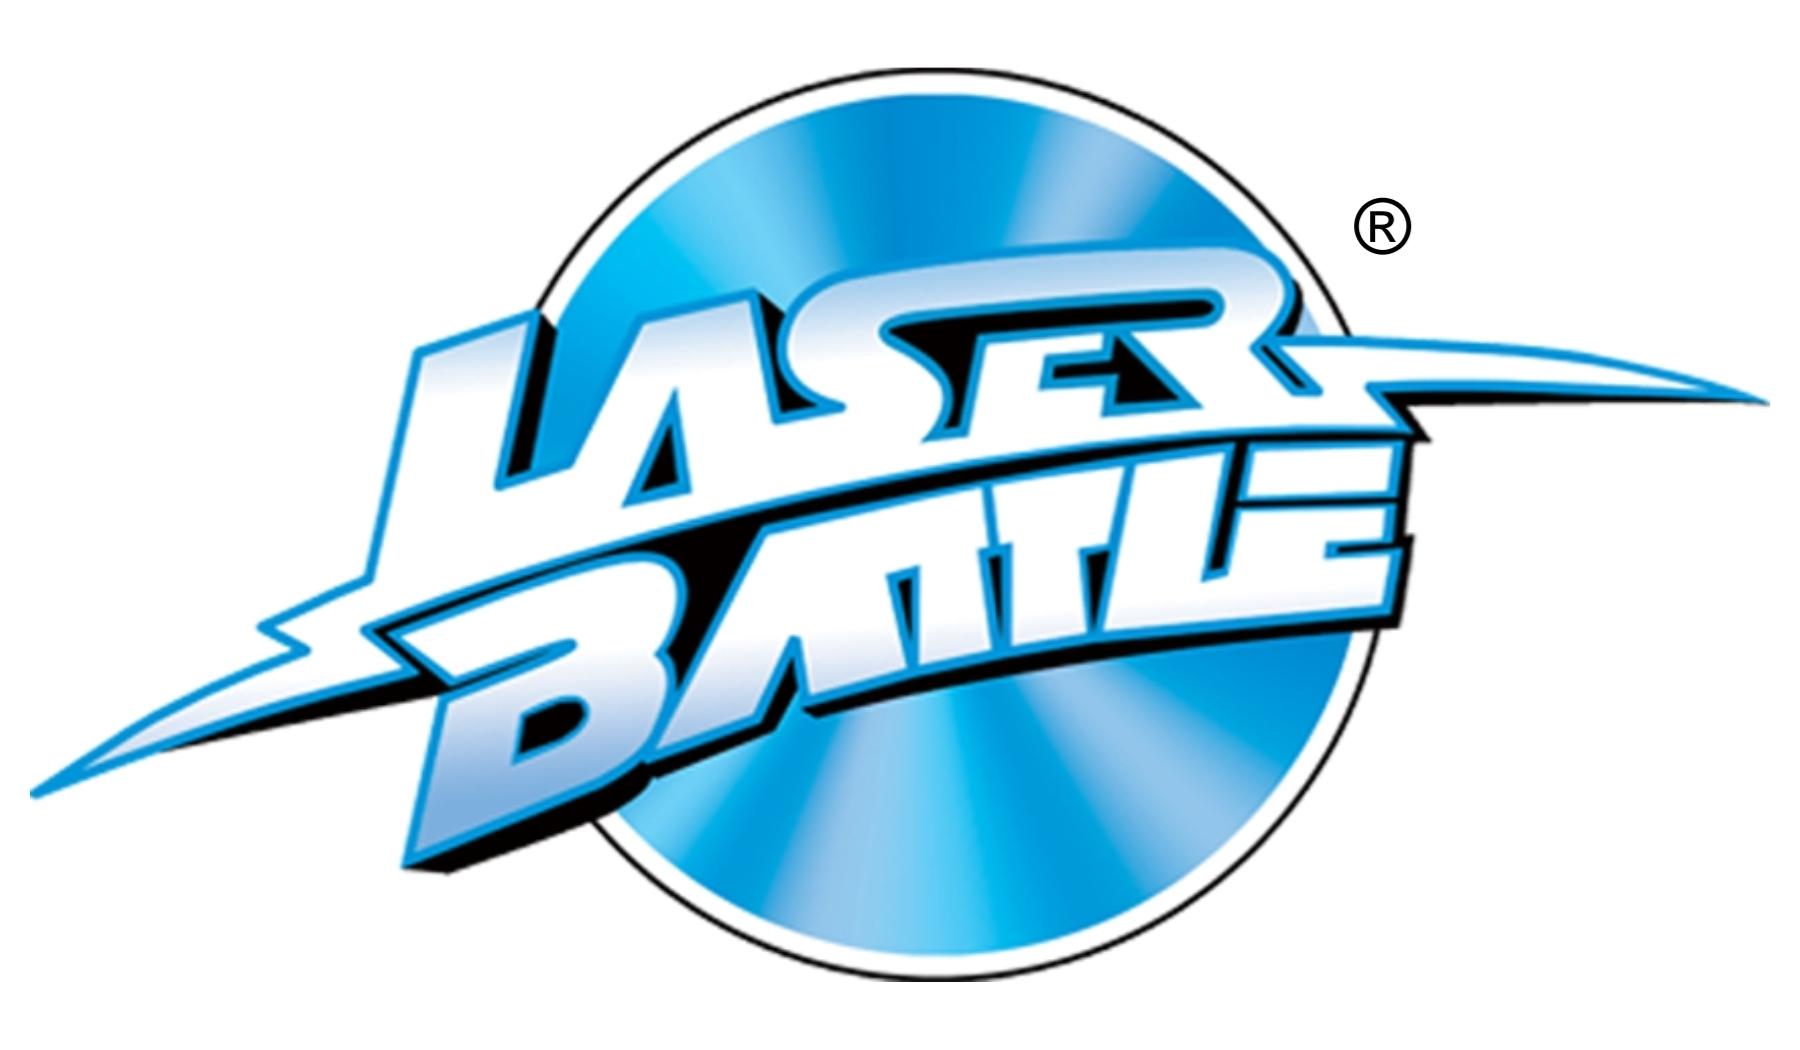 Picture of Laser Battle KL - 3 Games (Friday-Sunday)